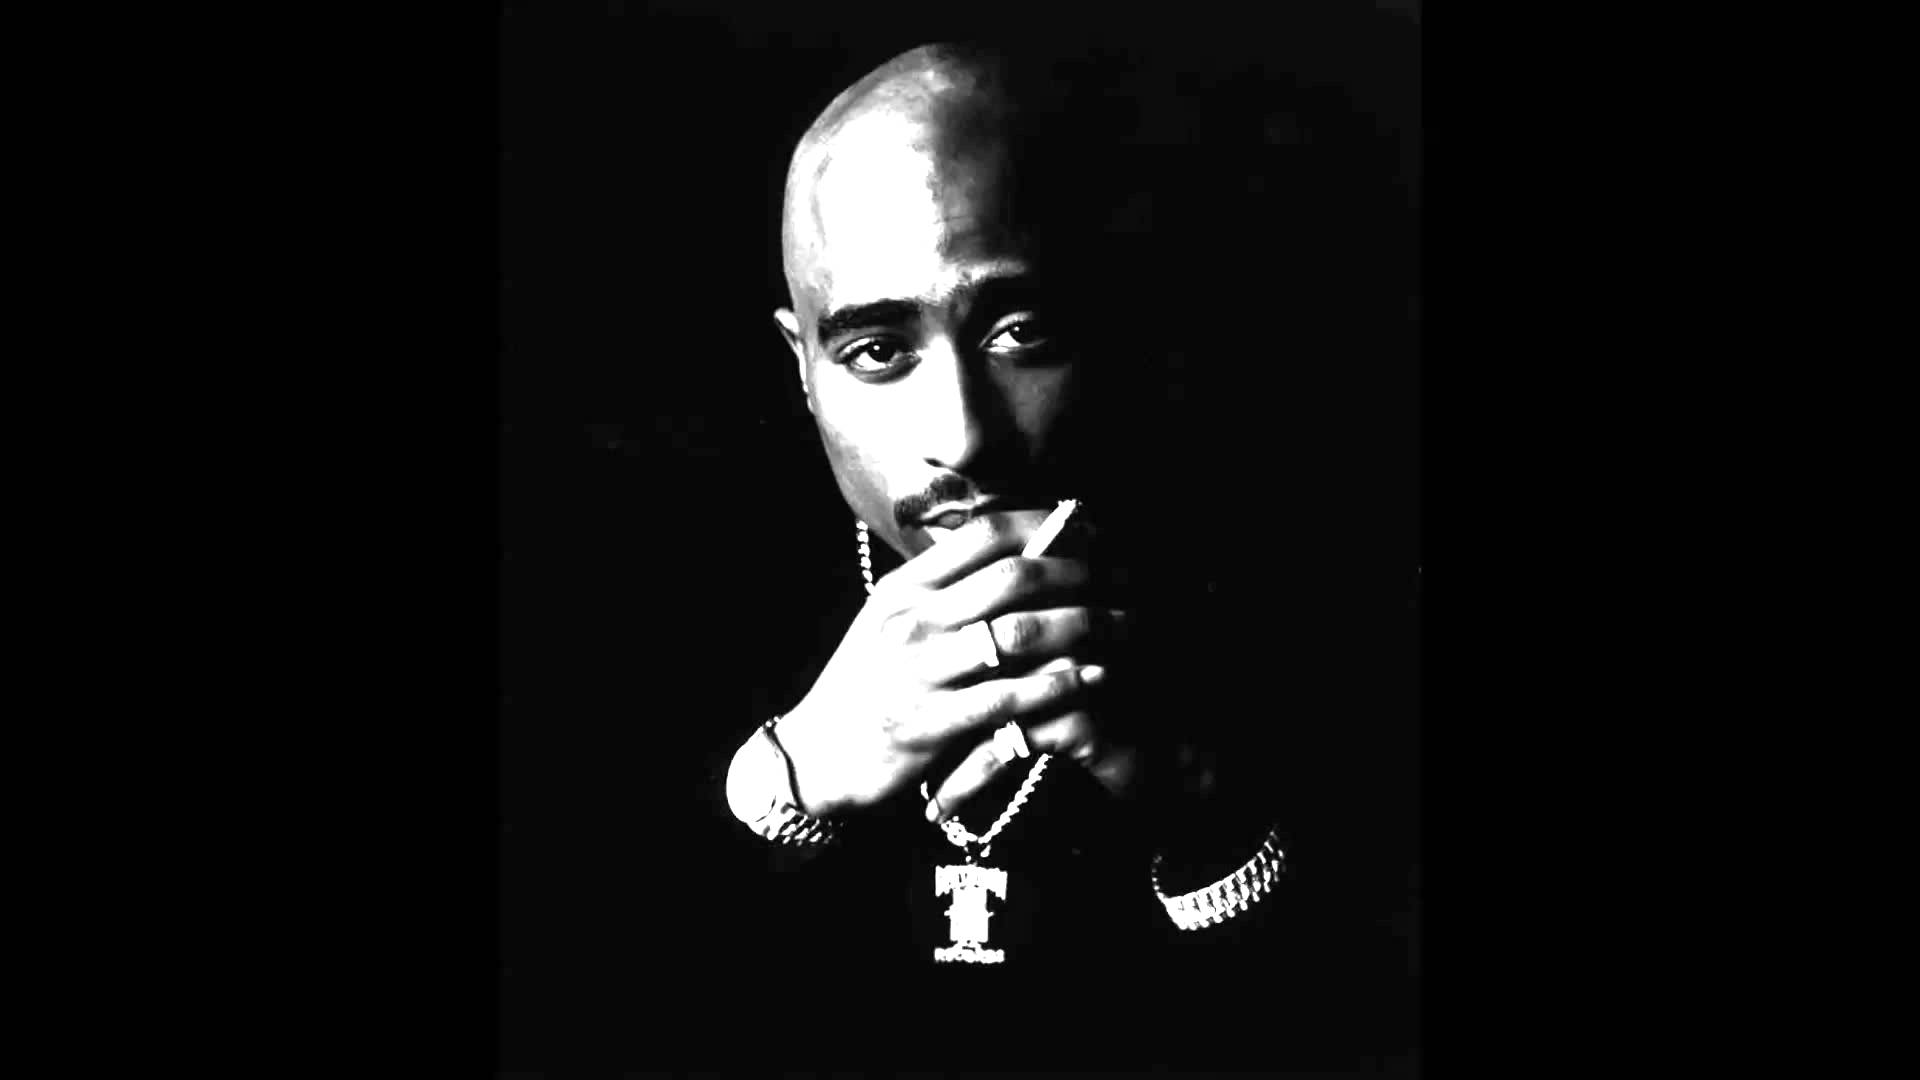 Tupac wallpaper - SF Wallpaper